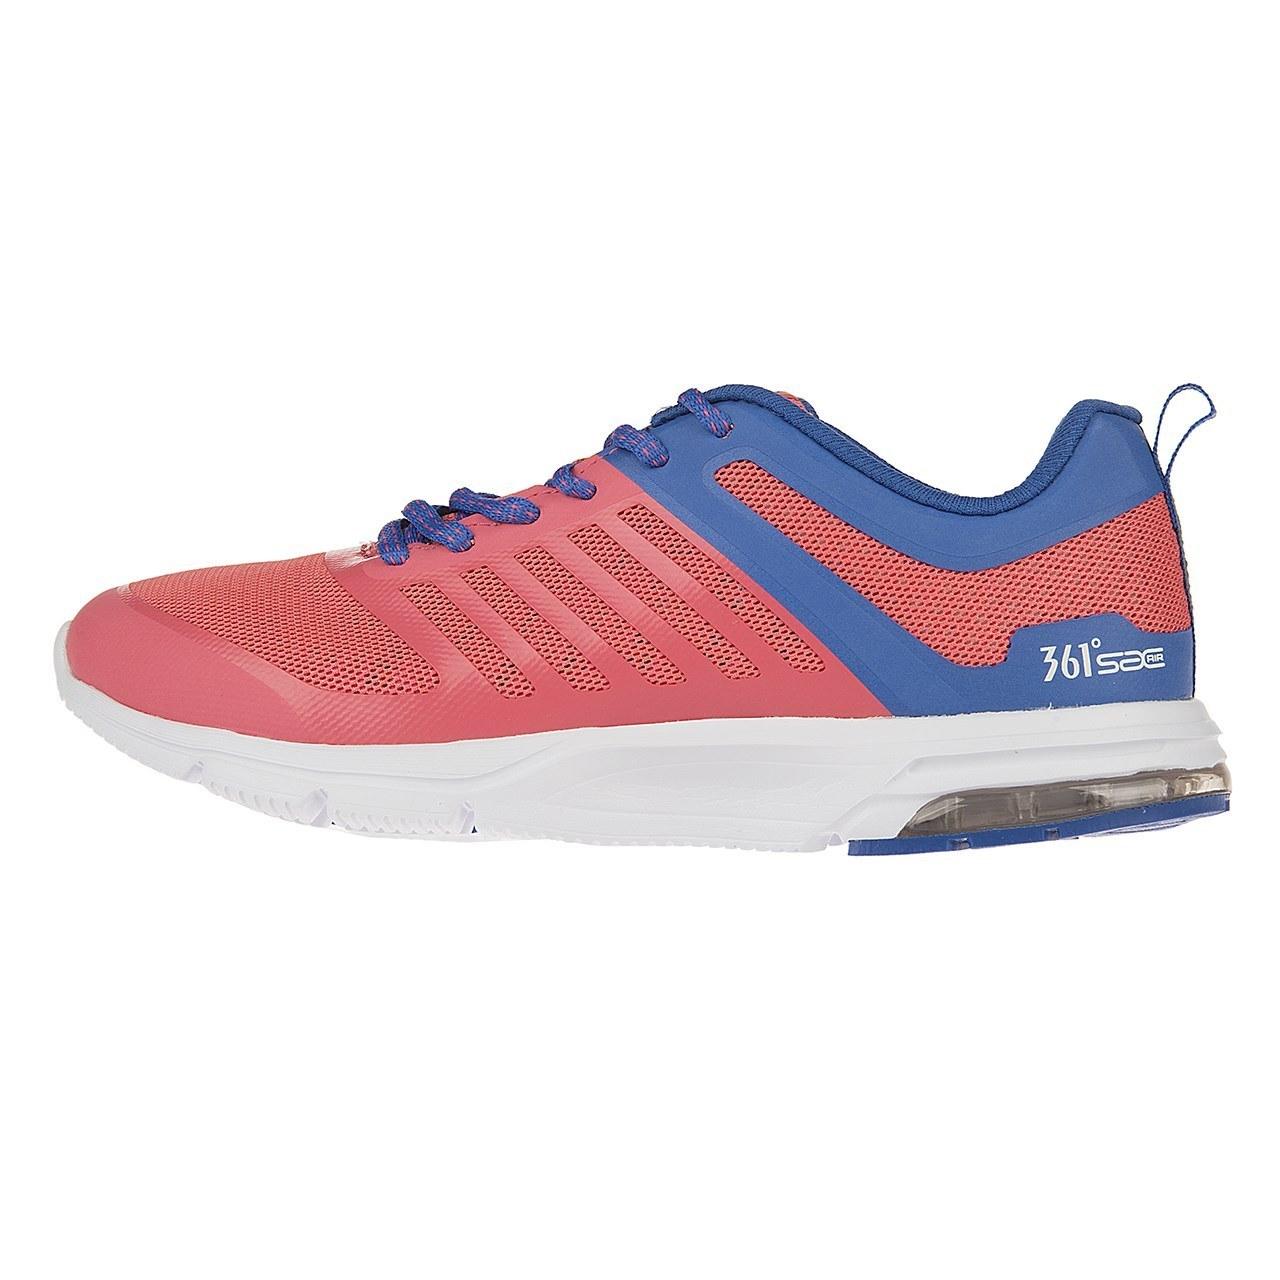 عکس کفش مخصوص دويدن زنانه 361 درجه مدل 22205 Model 22205 Running Shoes By 361 Degrees For Women کفش-مخصوص-دویدن-زنانه-361-درجه-مدل-22205 0